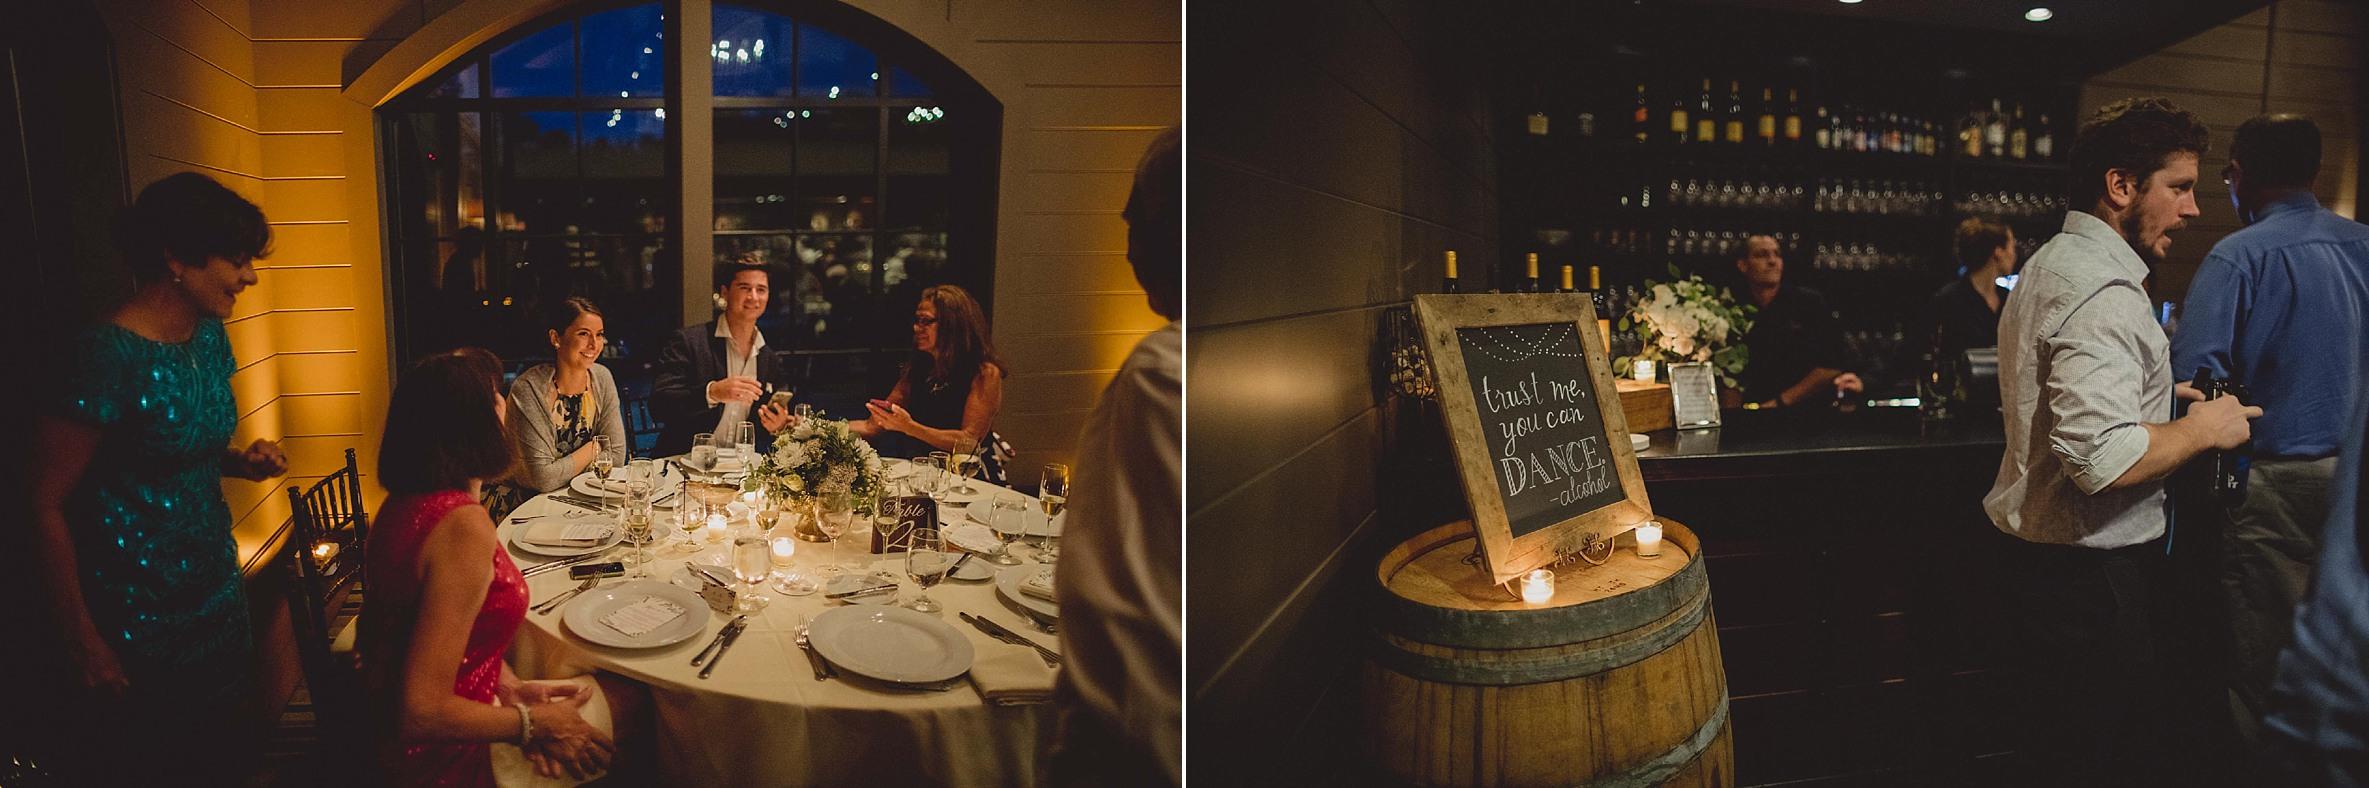 labelle winery wedding-107.jpg